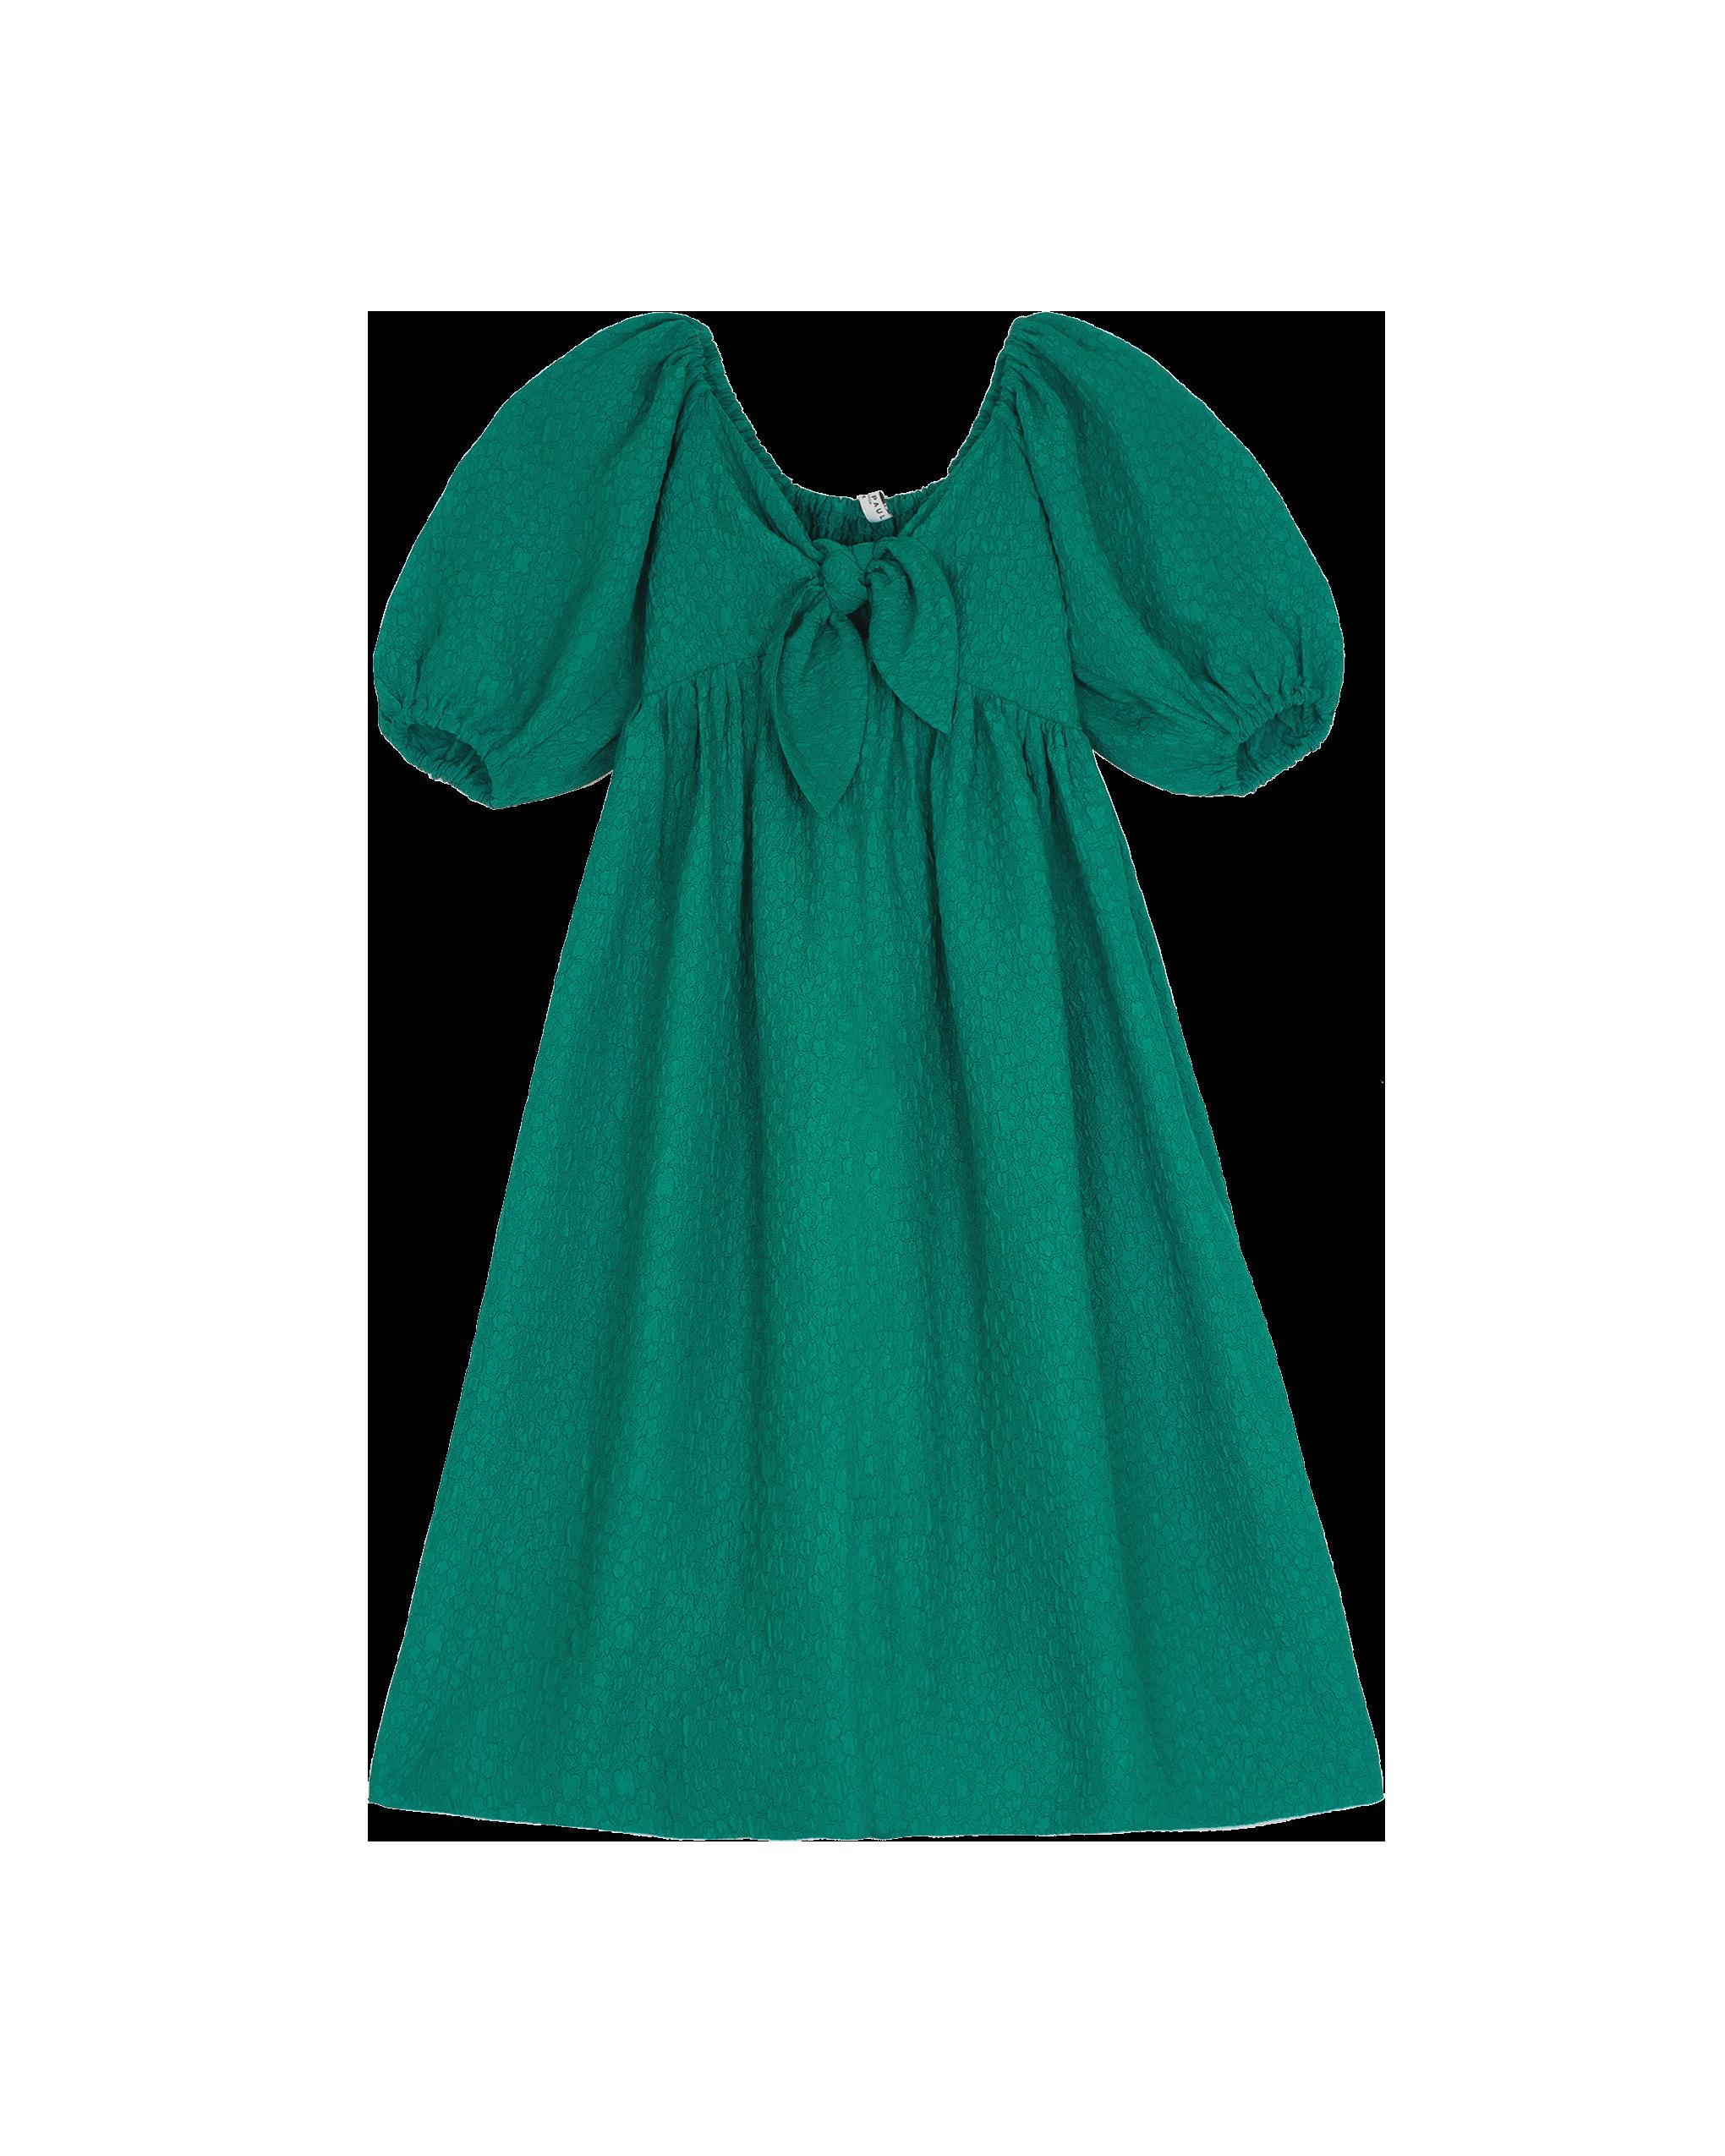 EMIN + PAUL green puff sleeve dress.